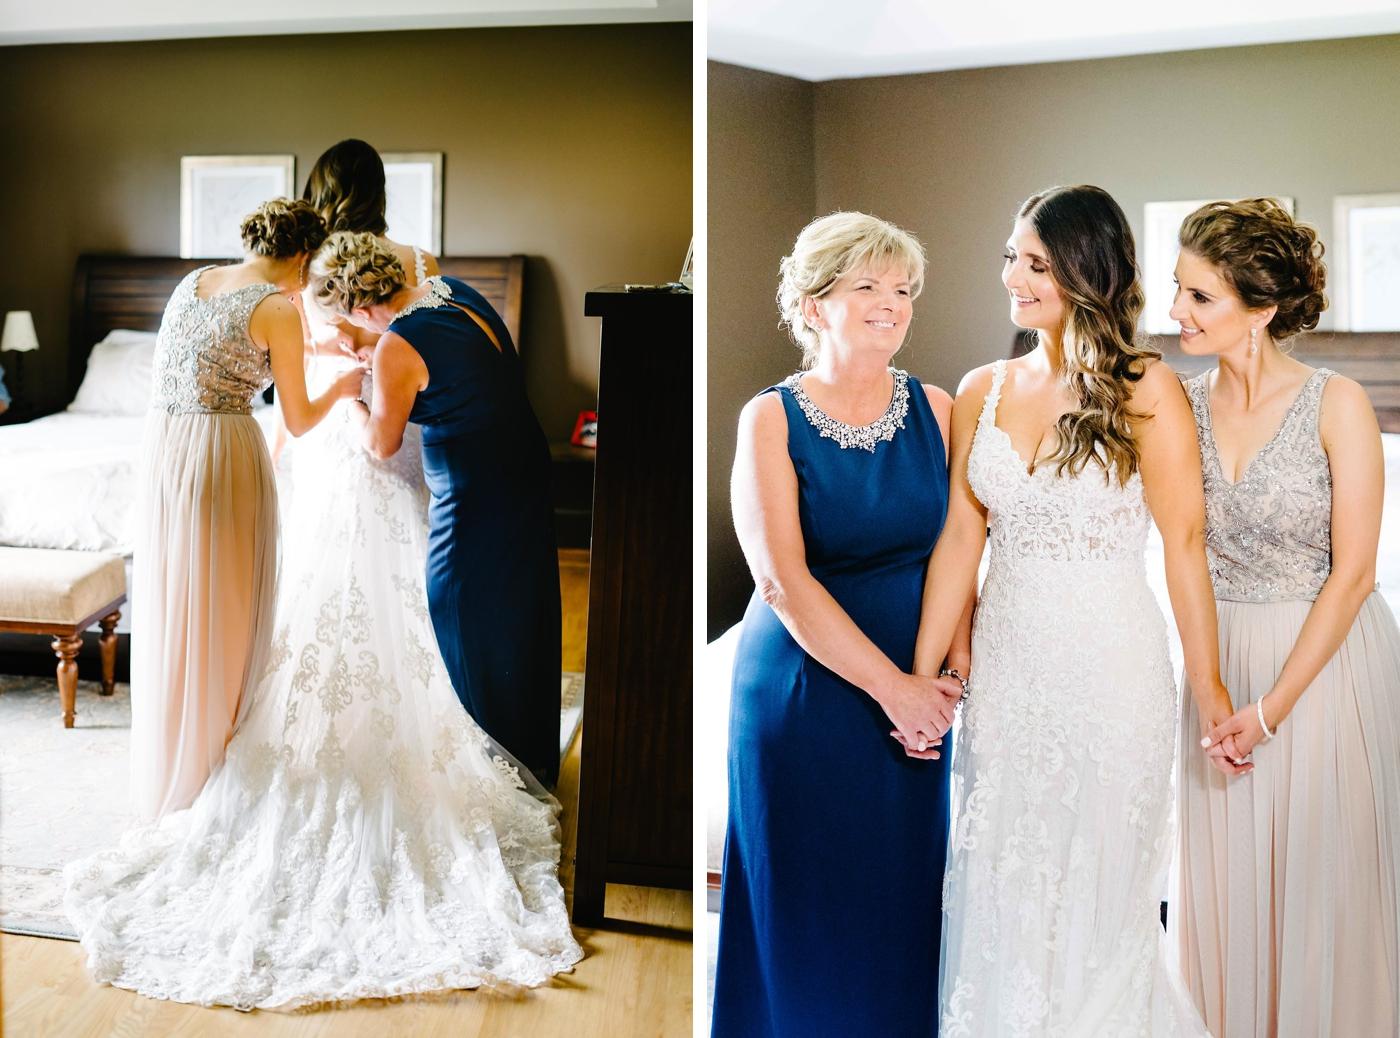 chicago-fine-art-wedding-photography-duncan15